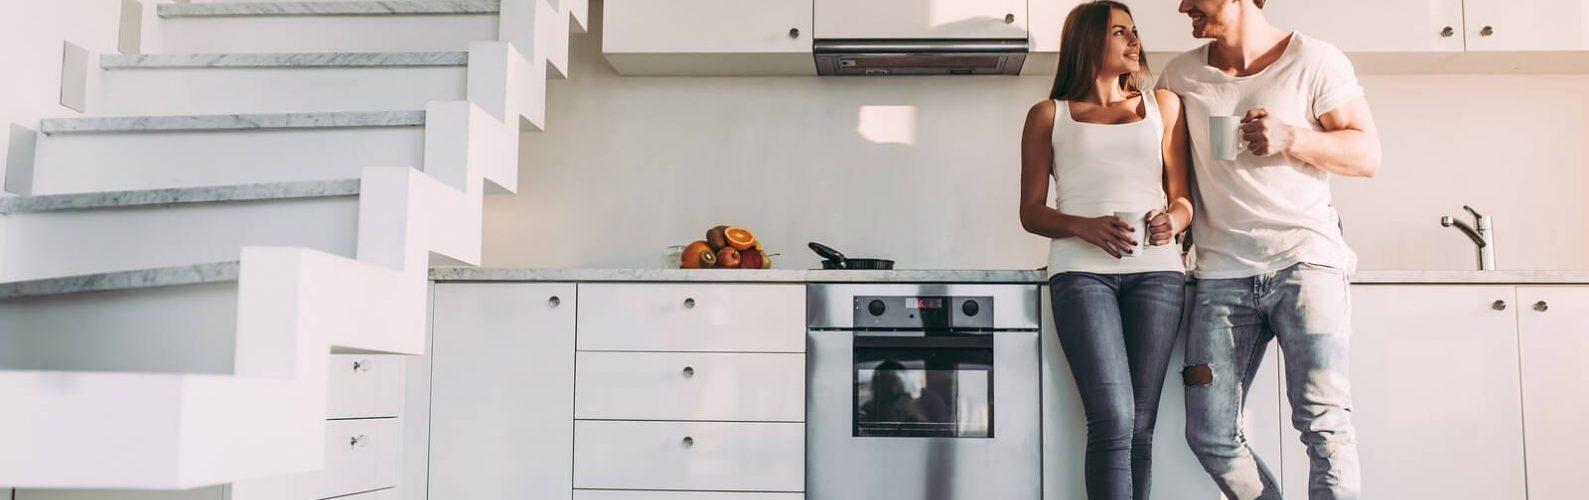 Home-Improvement-Ideas-on-budget